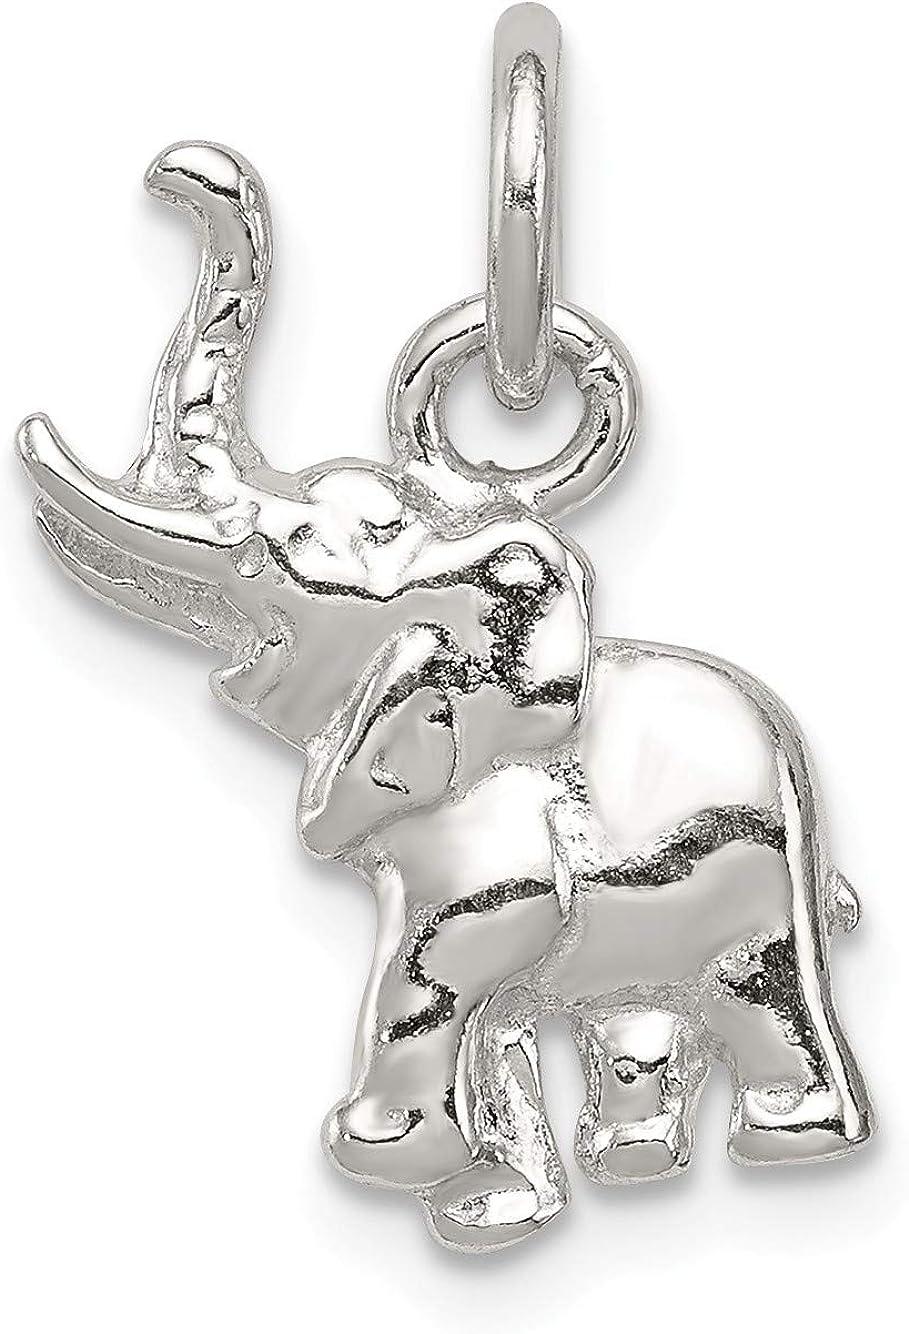 Bonyak Jewelry Sterling Silver Hummingbird Charm